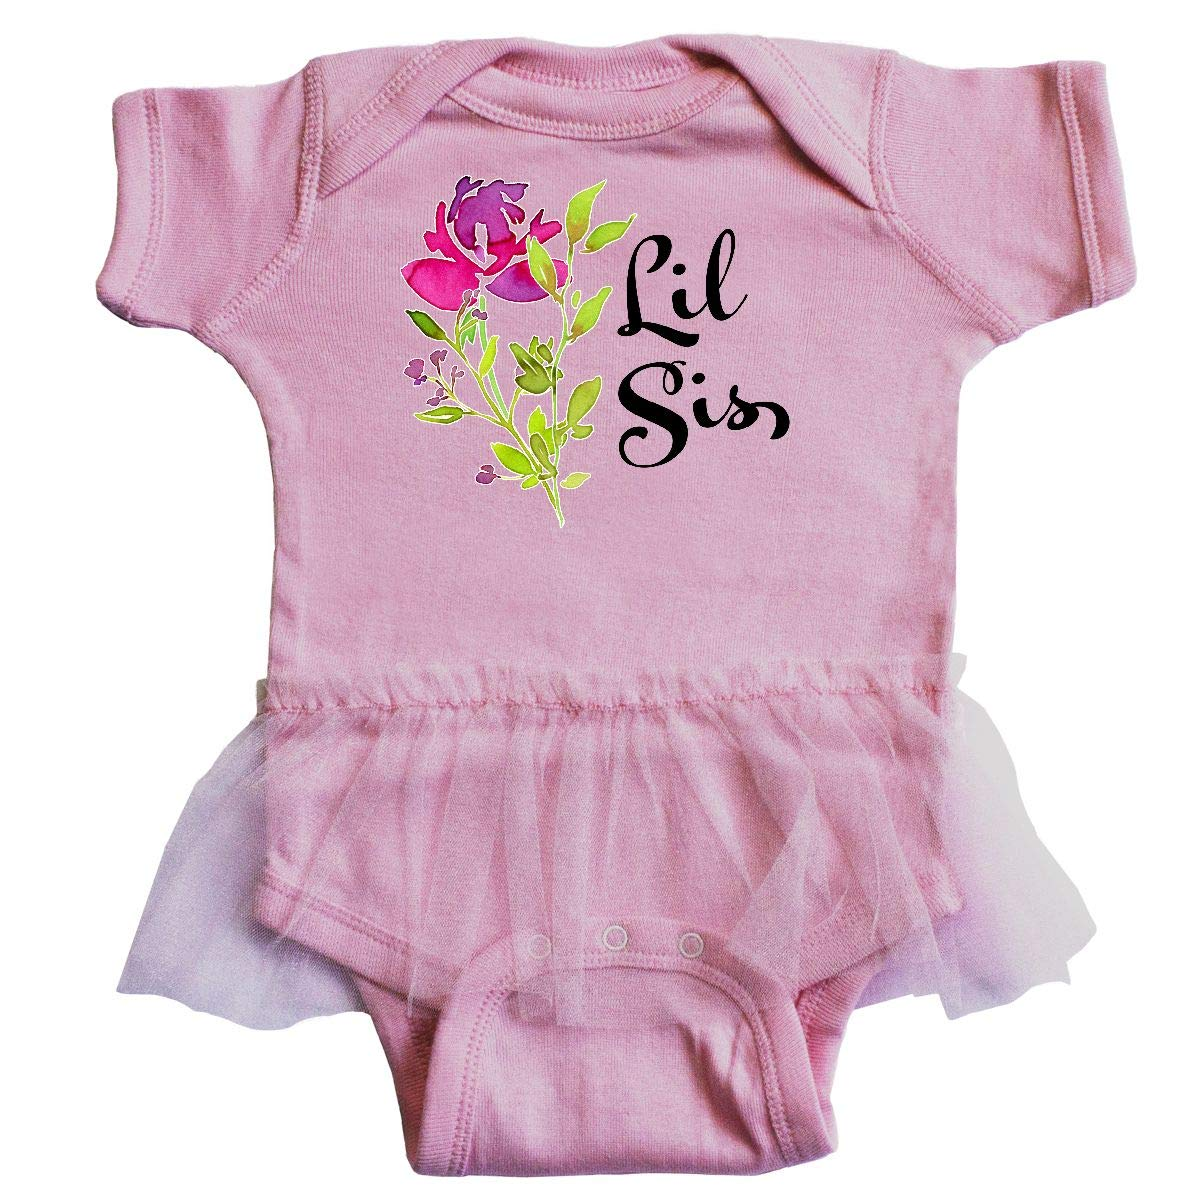 Baby Girls Long Sleeve Jumpsuit Jiu Jitsu Silhouette Baby Clothes